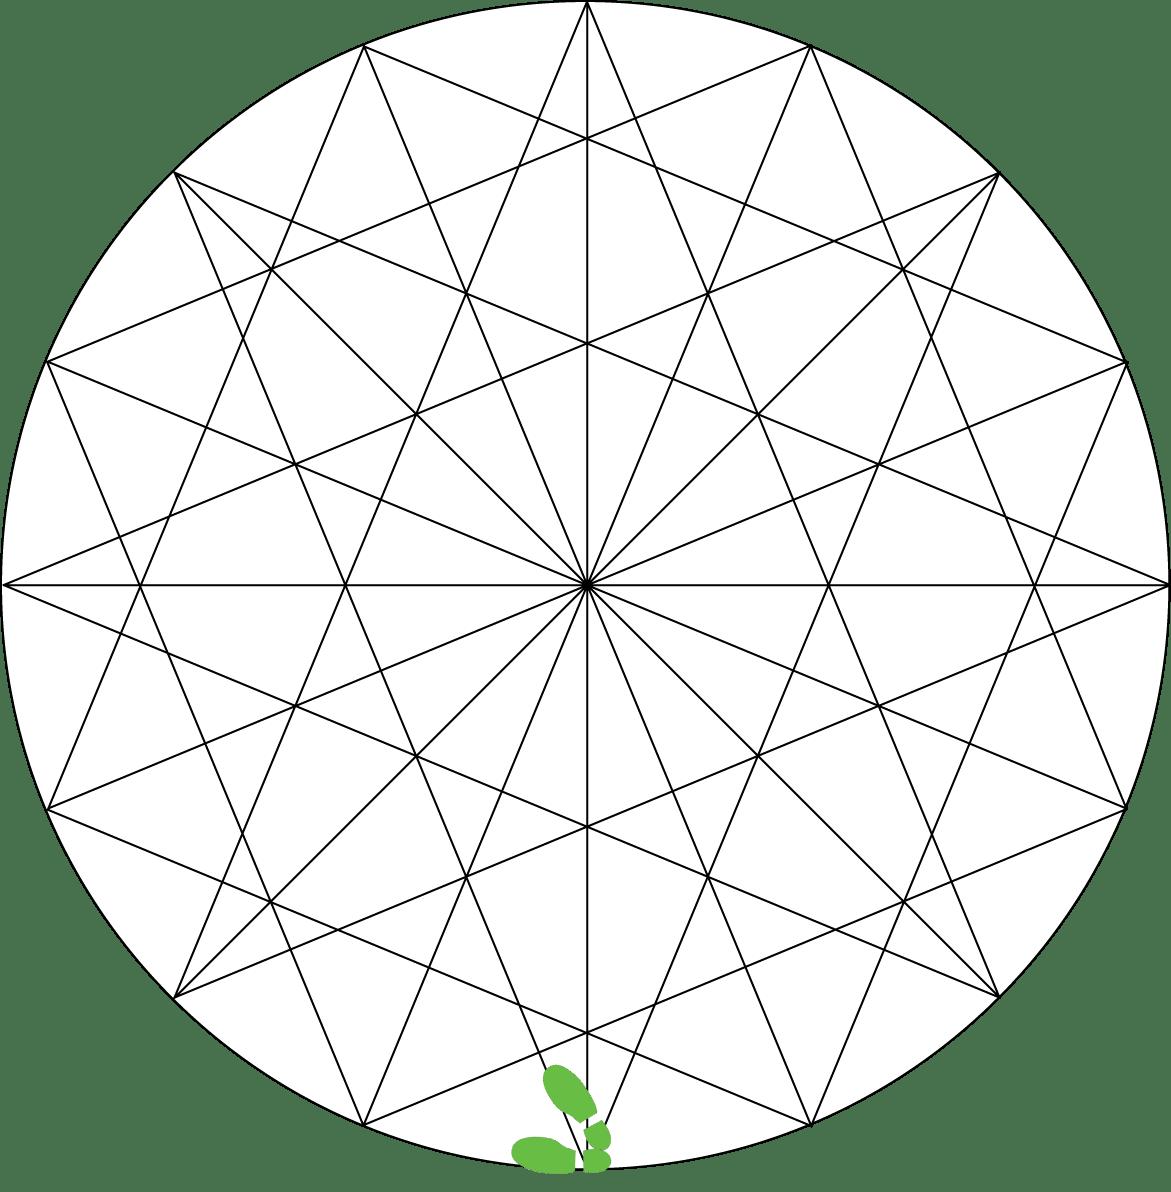 Fieldserver Wiring Diagrams Fs25 Null Modem Chipkin Automation